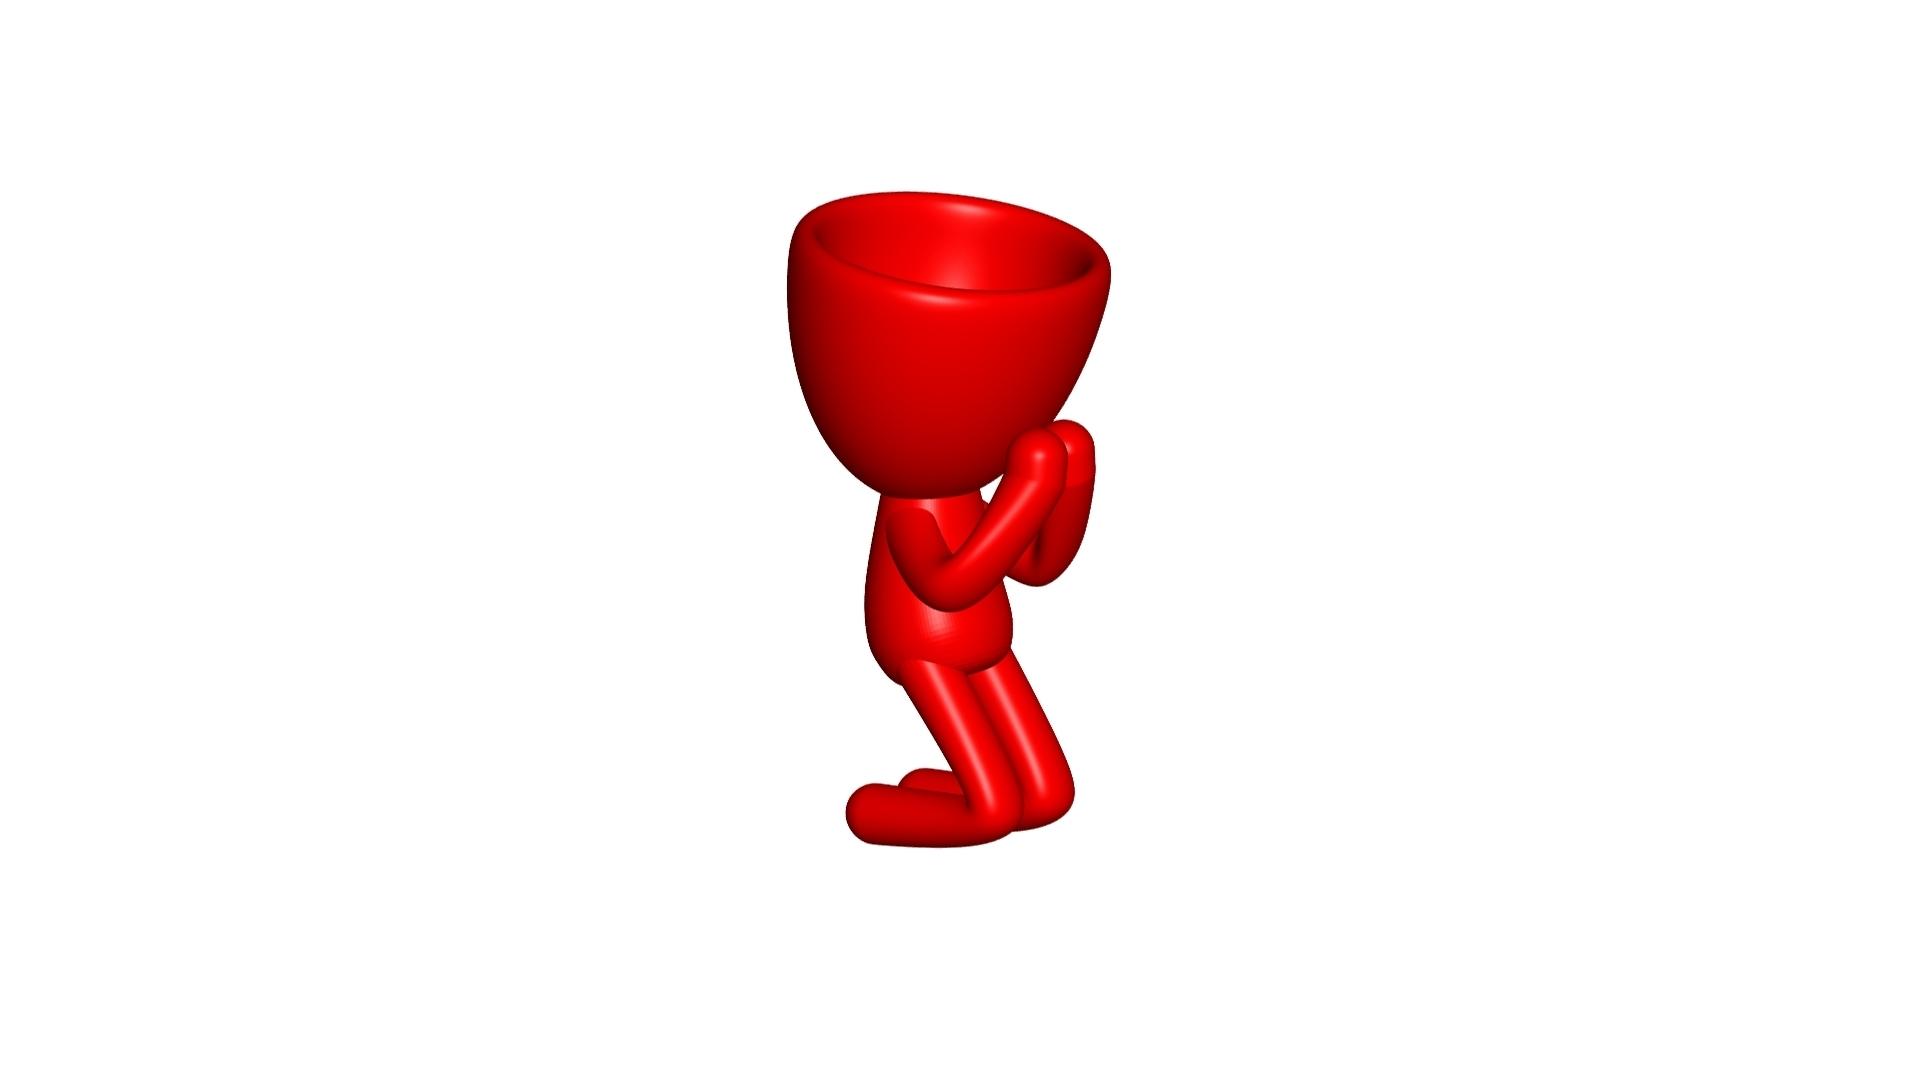 Vaso_09_Rojo_1.jpg Download free STL file REZANDO AGRADECIENDO JARRÓN MACETA ROBERT 09 - PRAYING THANKING VASE FLOWERPOT ROBERT 09 • 3D printer model, PRODUSTL56